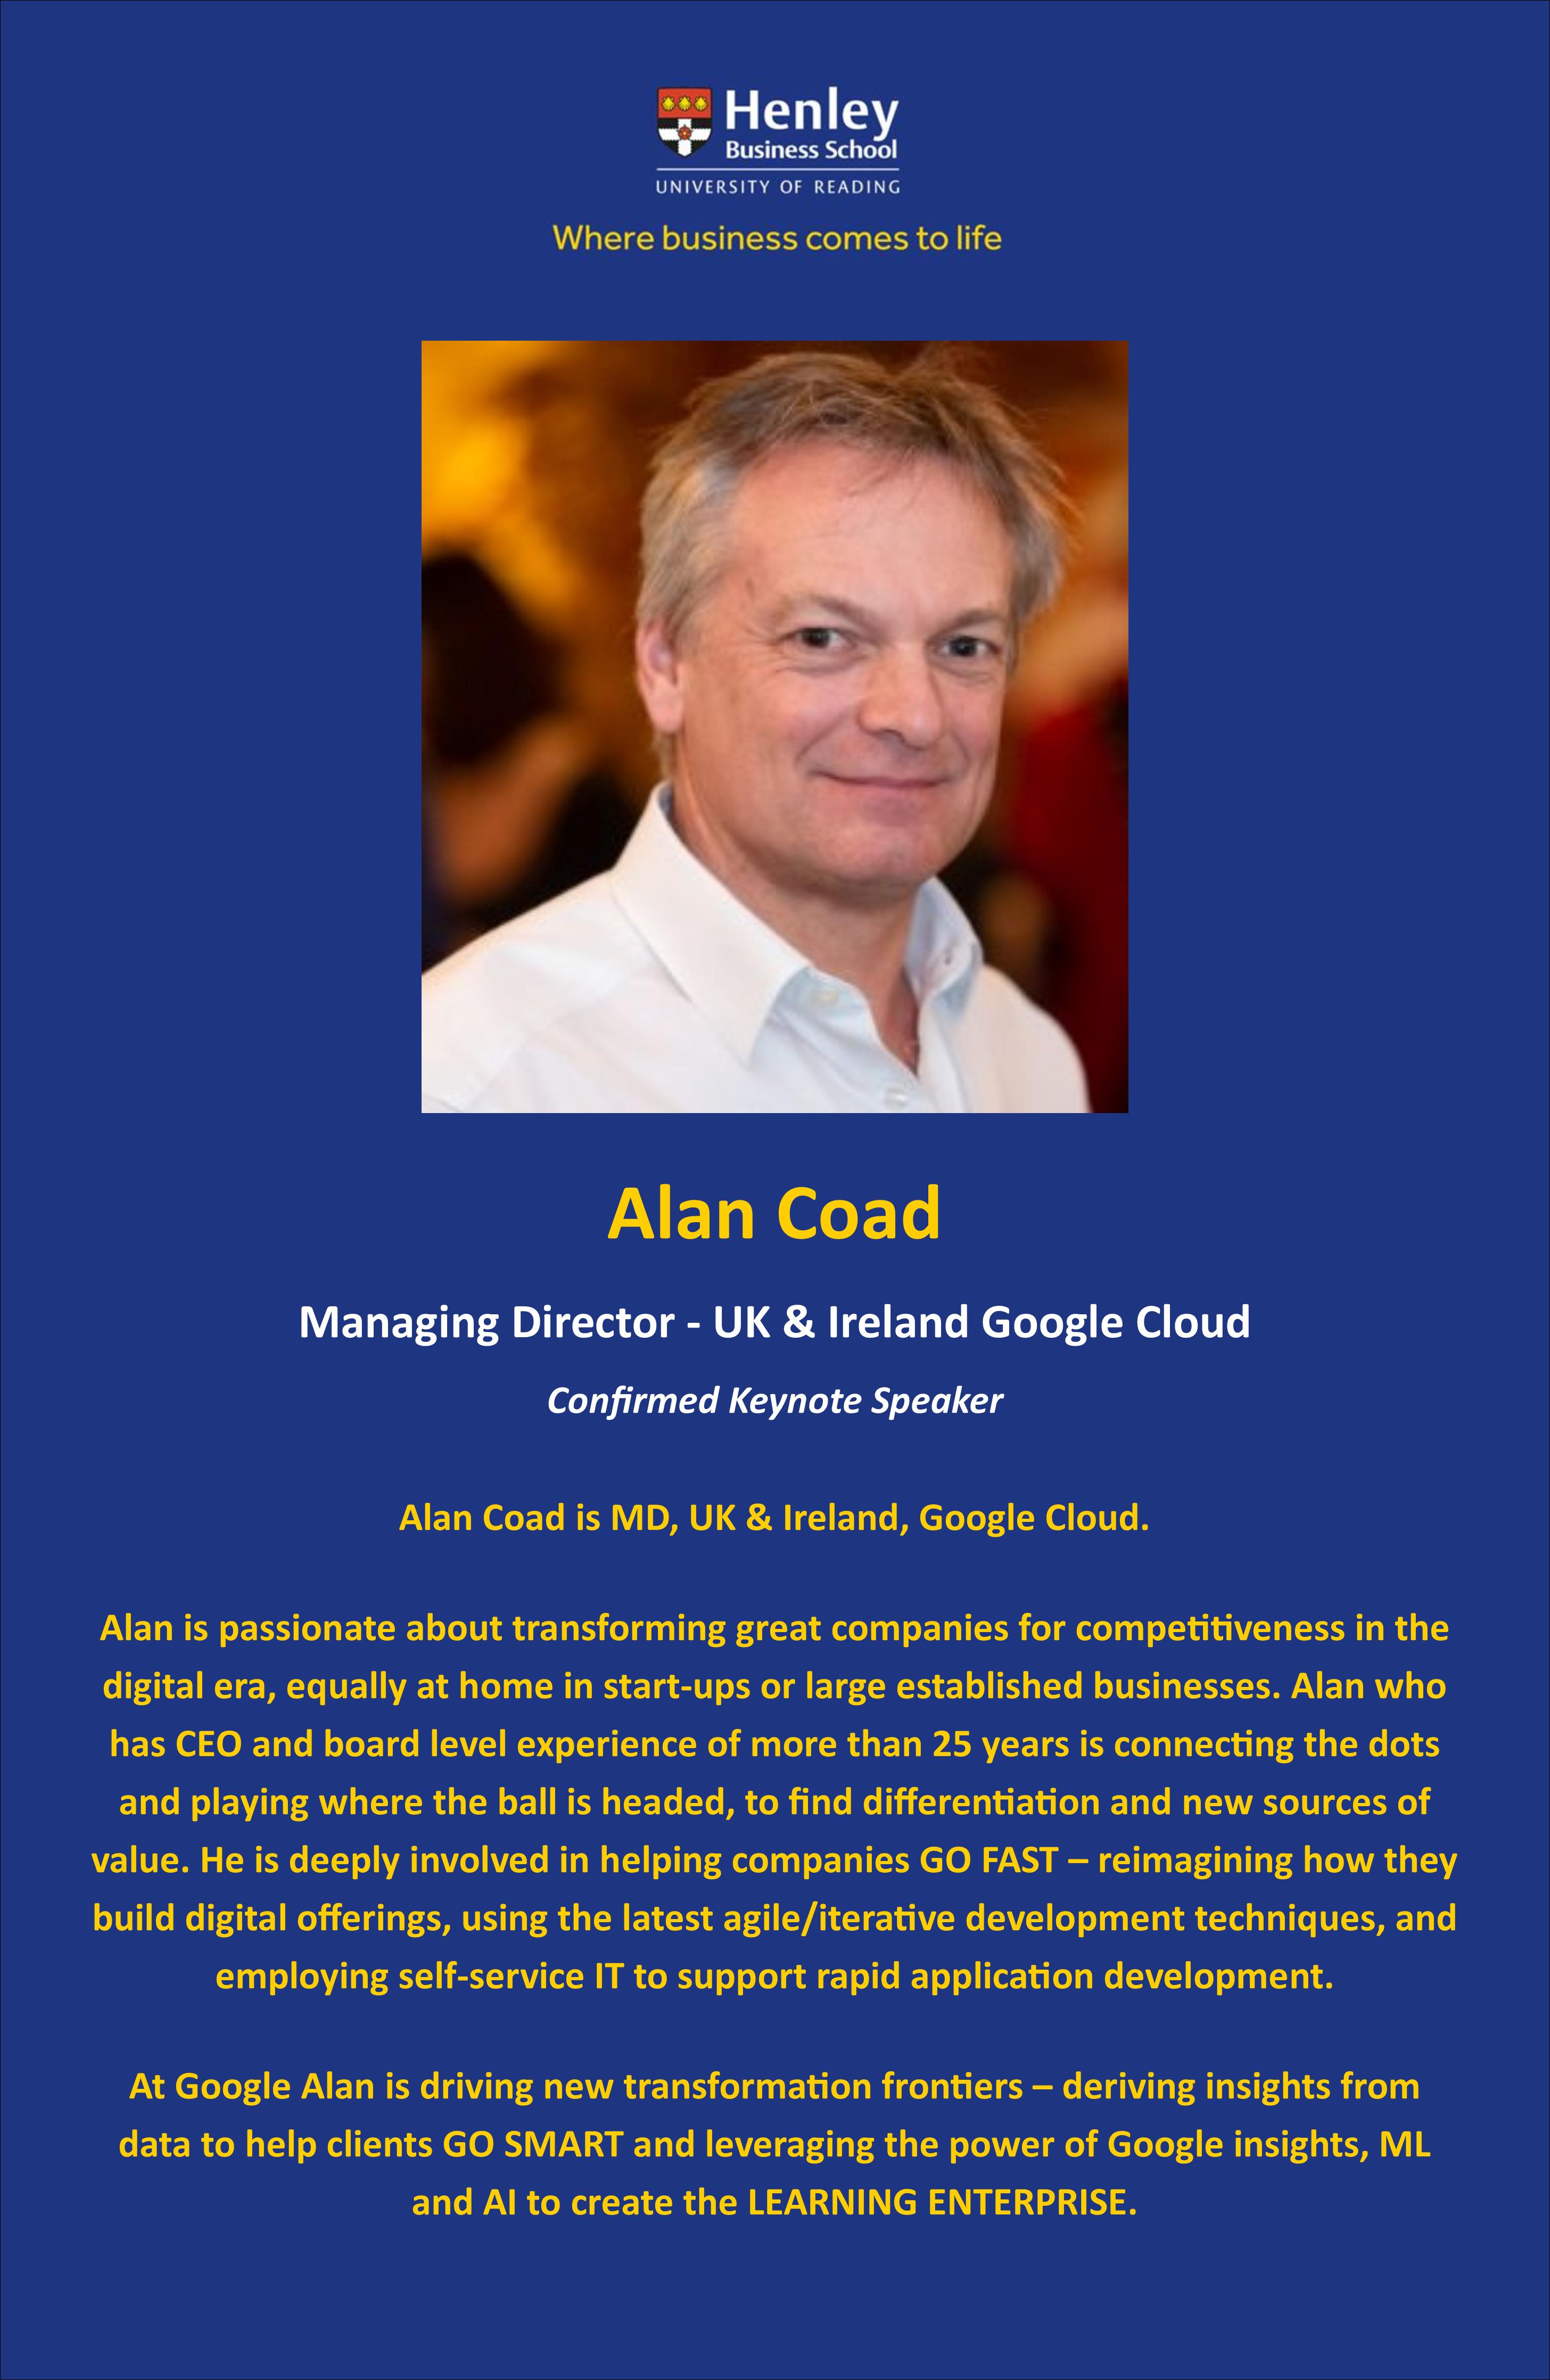 Alan Coad Bio